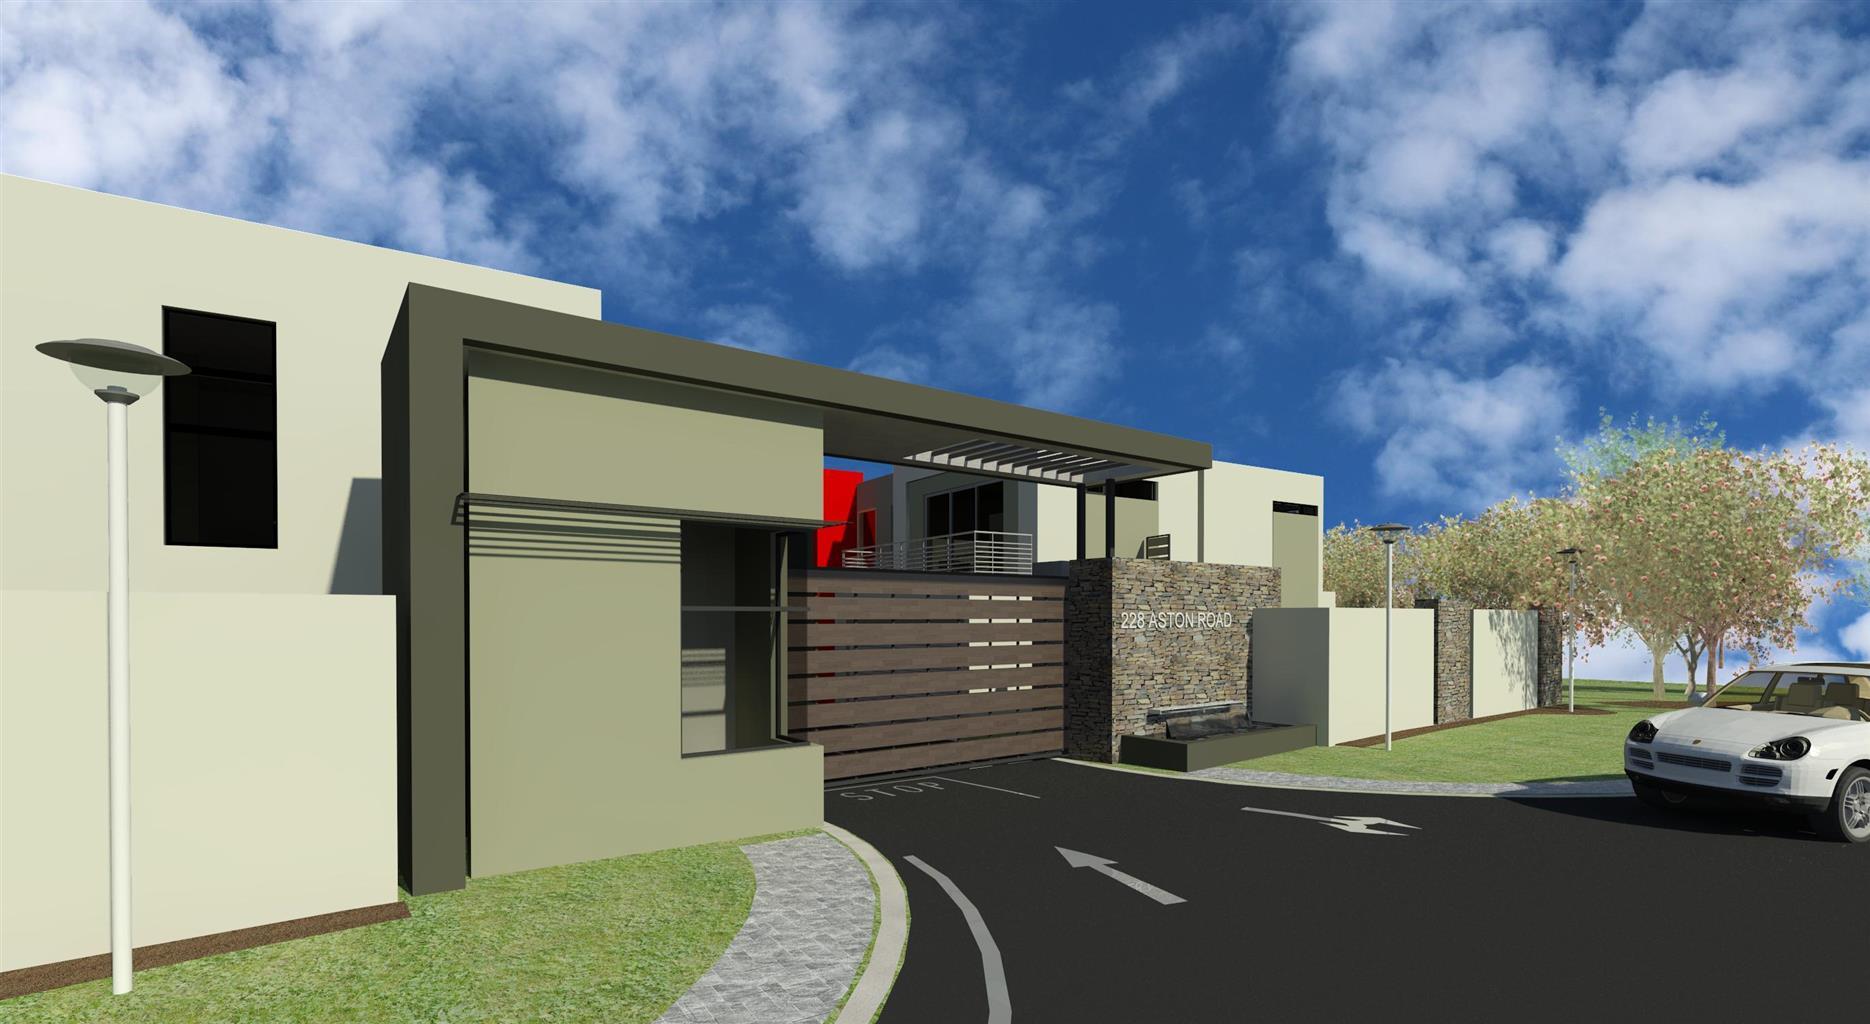 New Developments Townhouses for Sale in Sandown